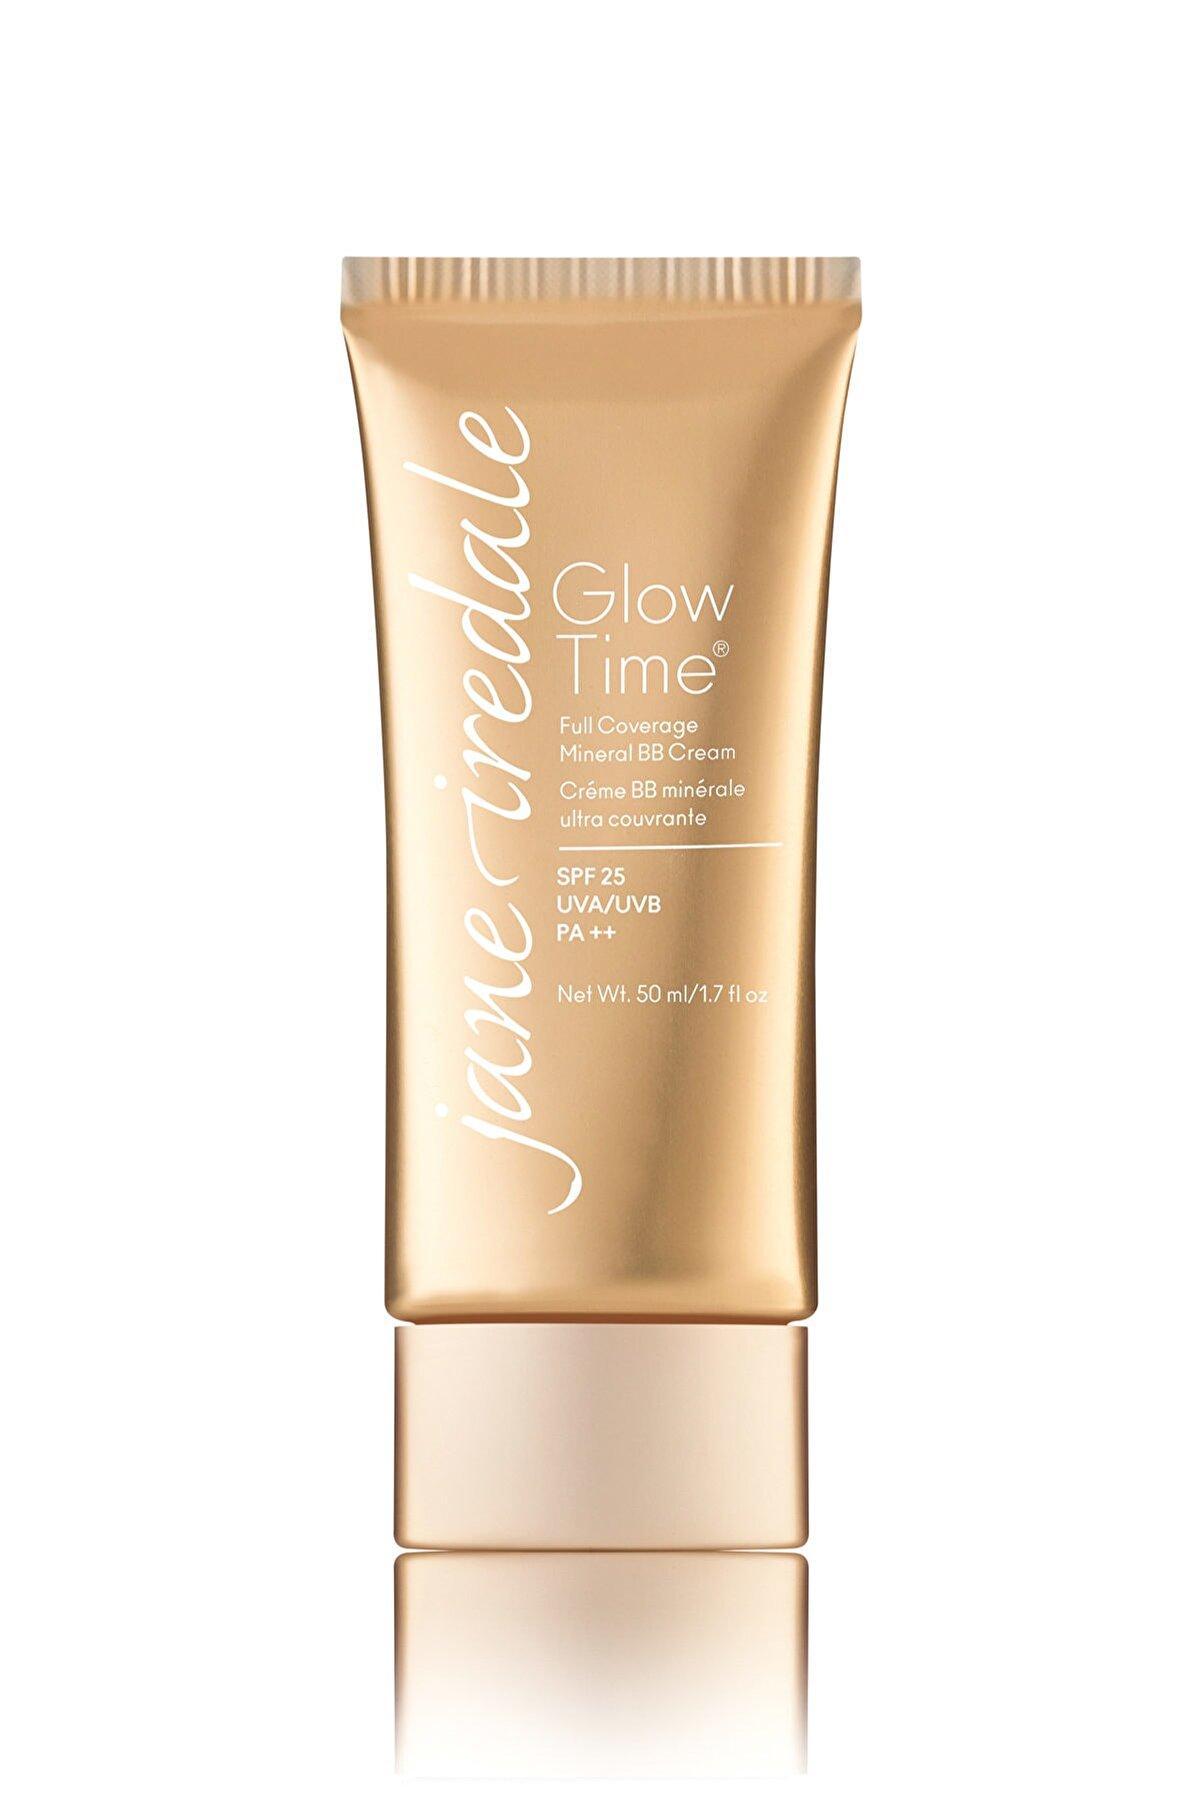 Jane Iredale Glow Time Mineral BB Cream 50ml SPF 25 BB6 Light to Medium (orta açık)